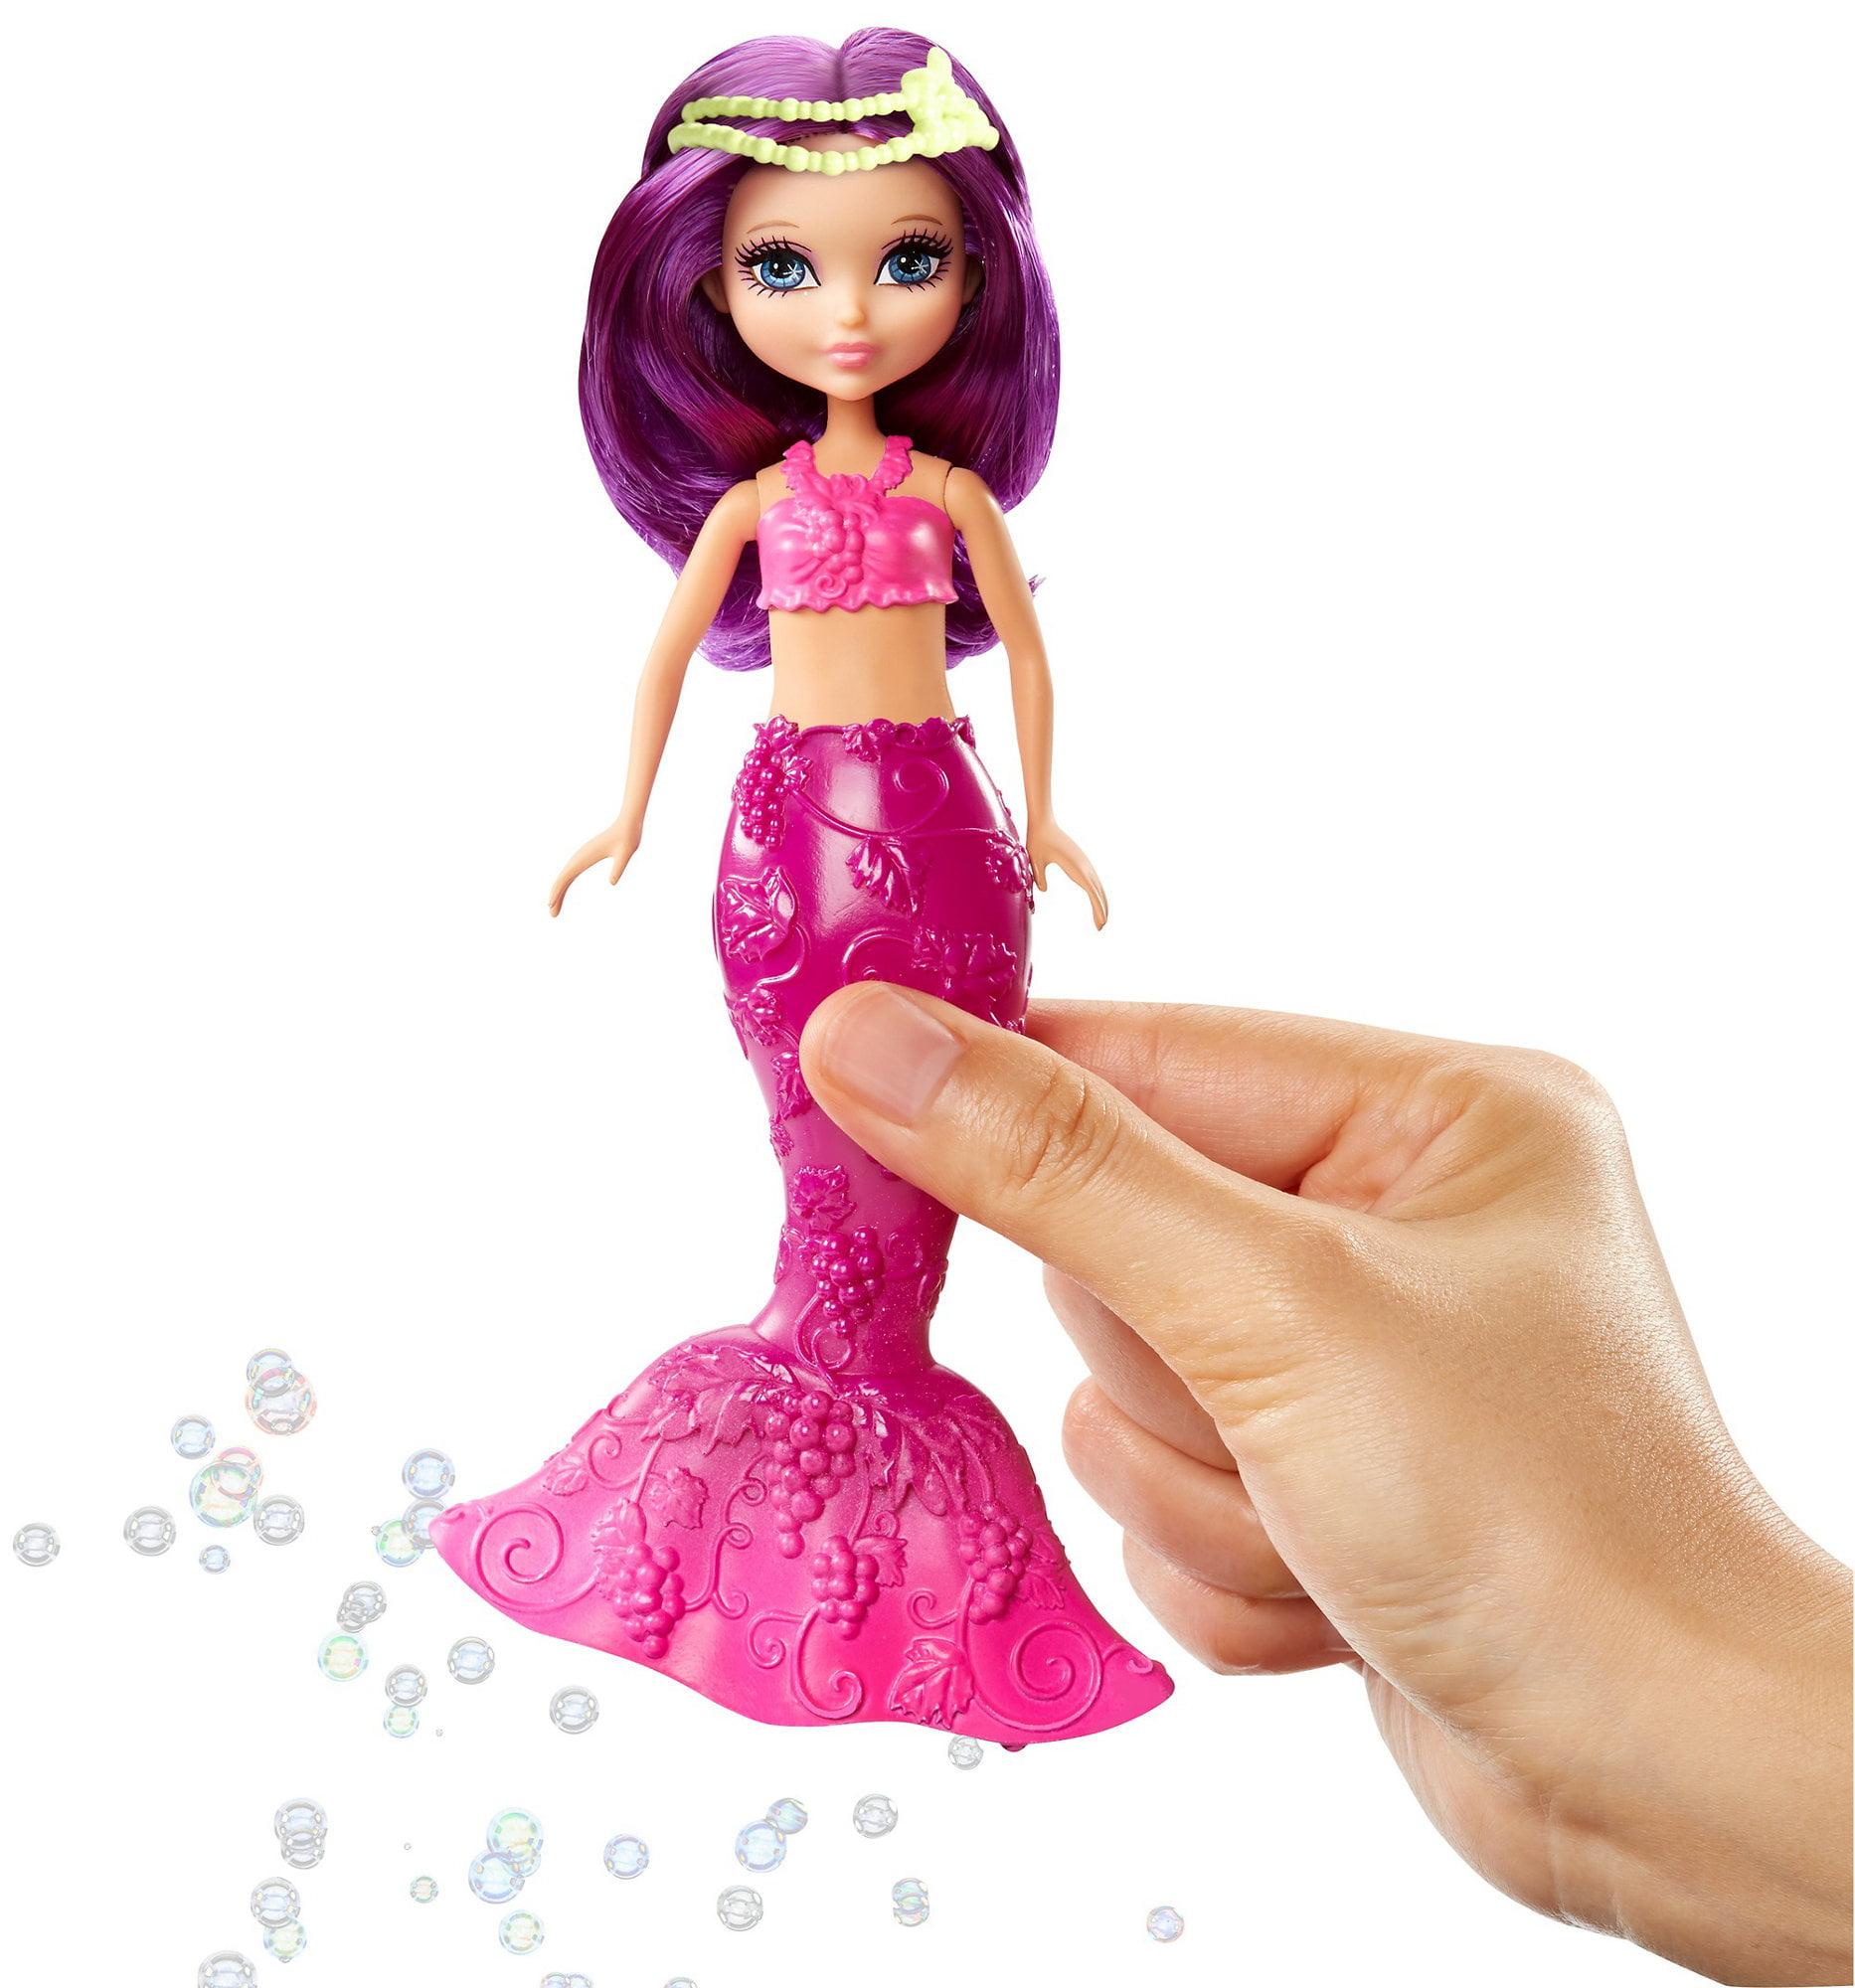 Barbie Dreamtopia Bubbles �N Fun Purple Mermaid Doll by MATTEL INC.